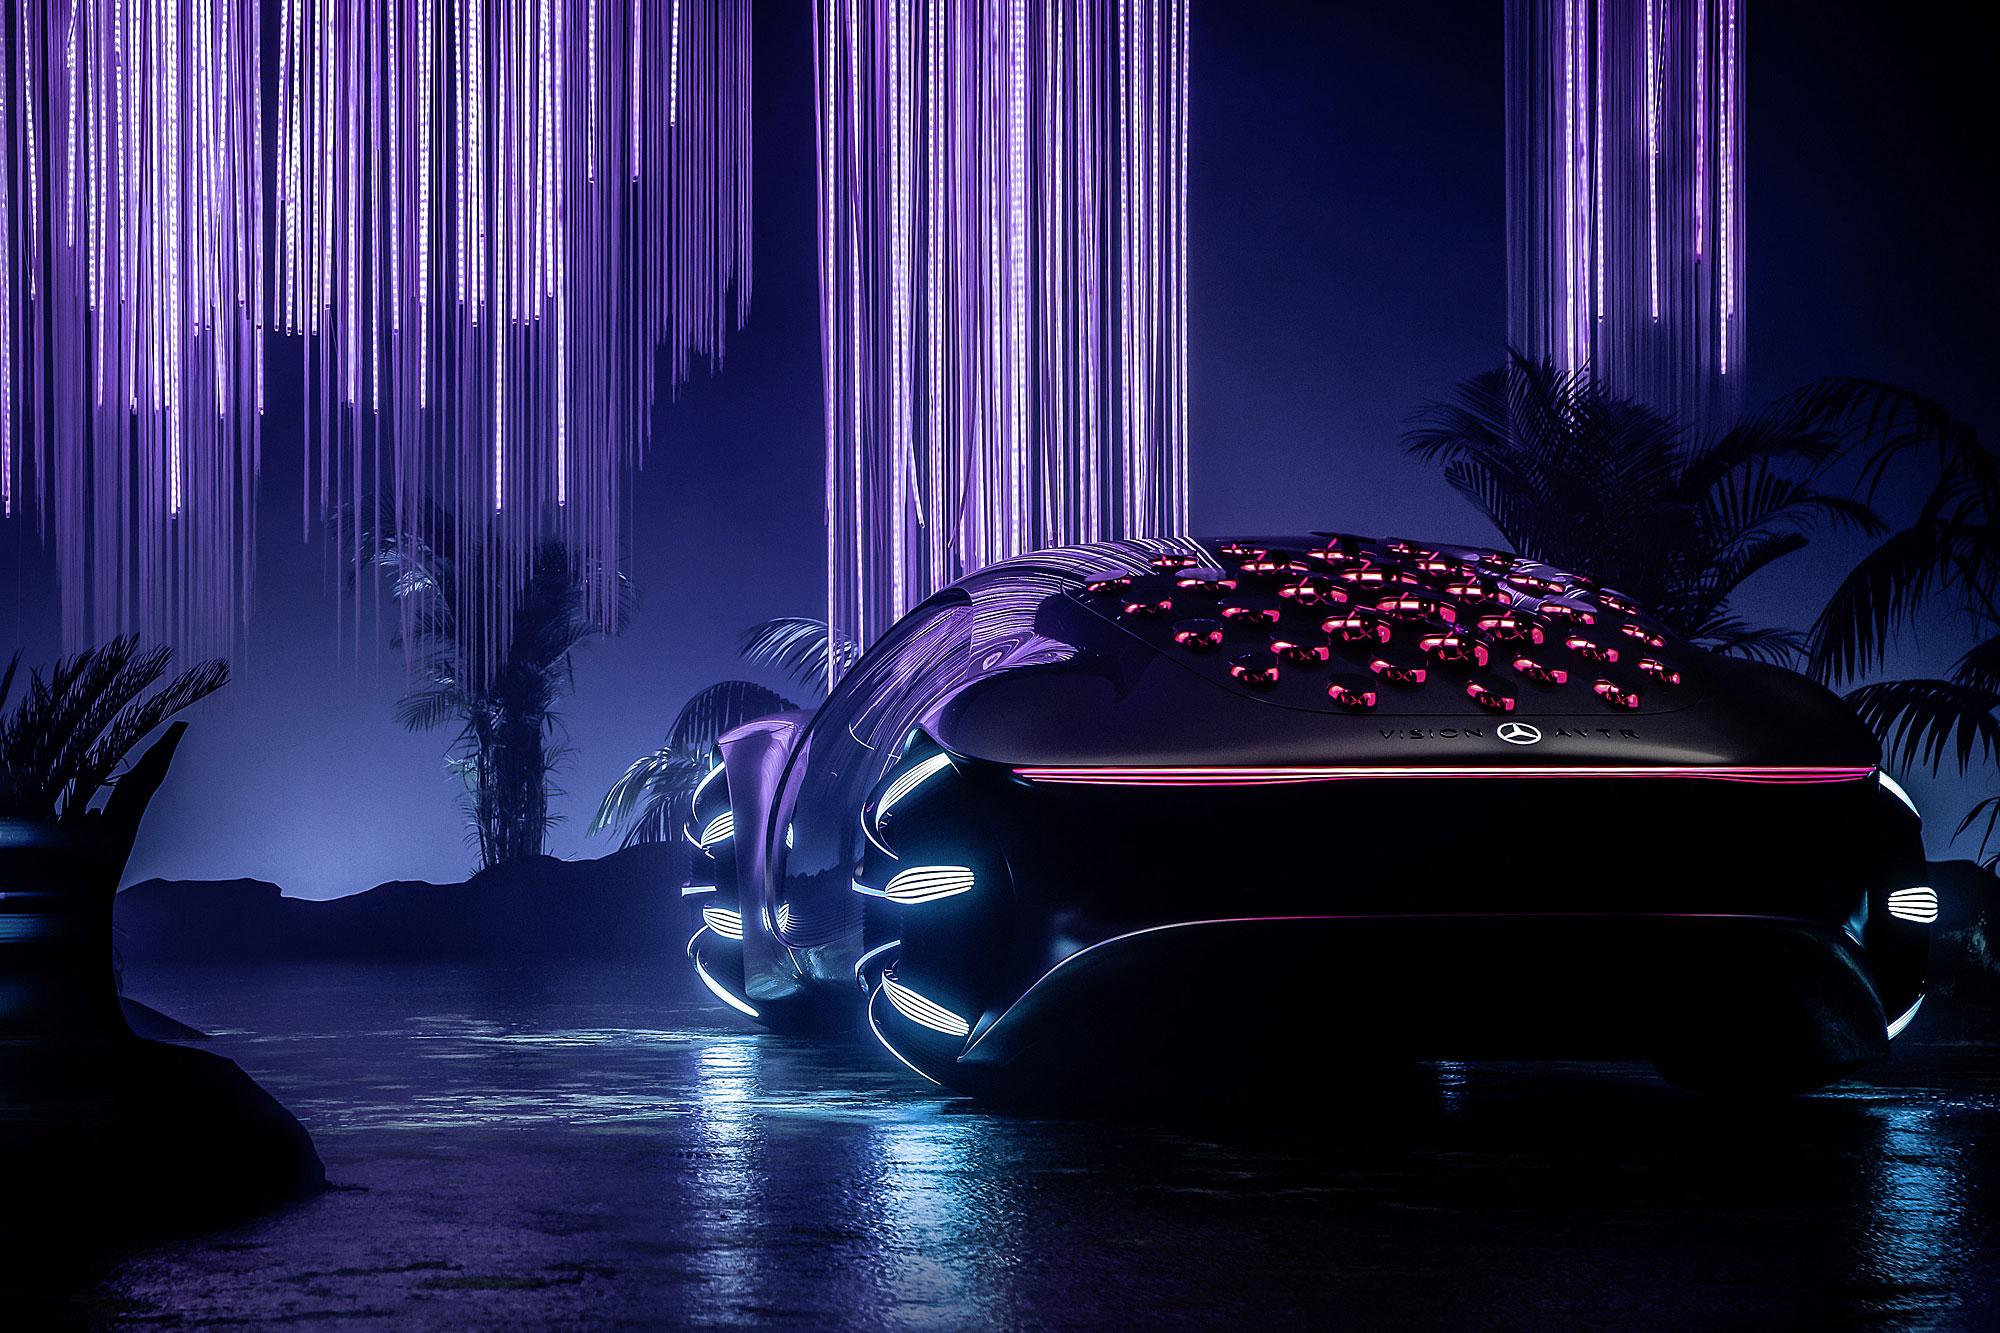 Vision AVTR 主要目的在於為《Avatar 阿凡達》電影續集暖身。